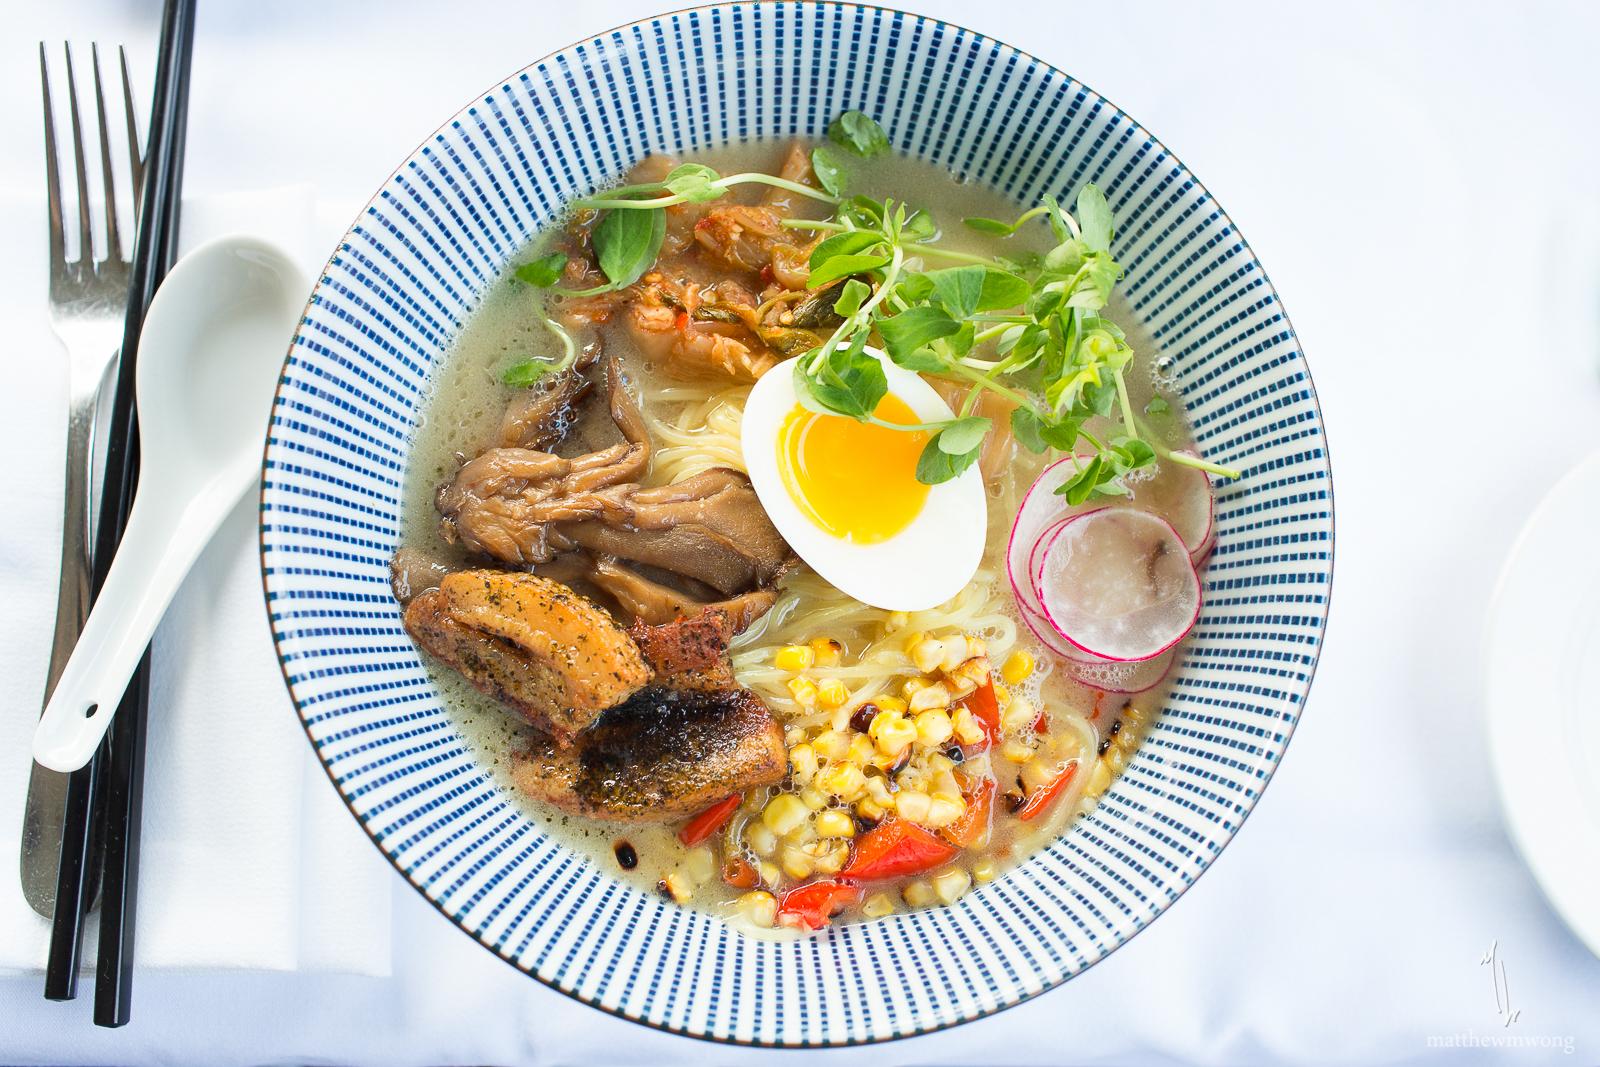 Tonkotsu Ramen- Pork belly, soft boiled egg, soy pickled mushrooms, roasted sweet peppers, grilled corn, shaved radish, kimchi